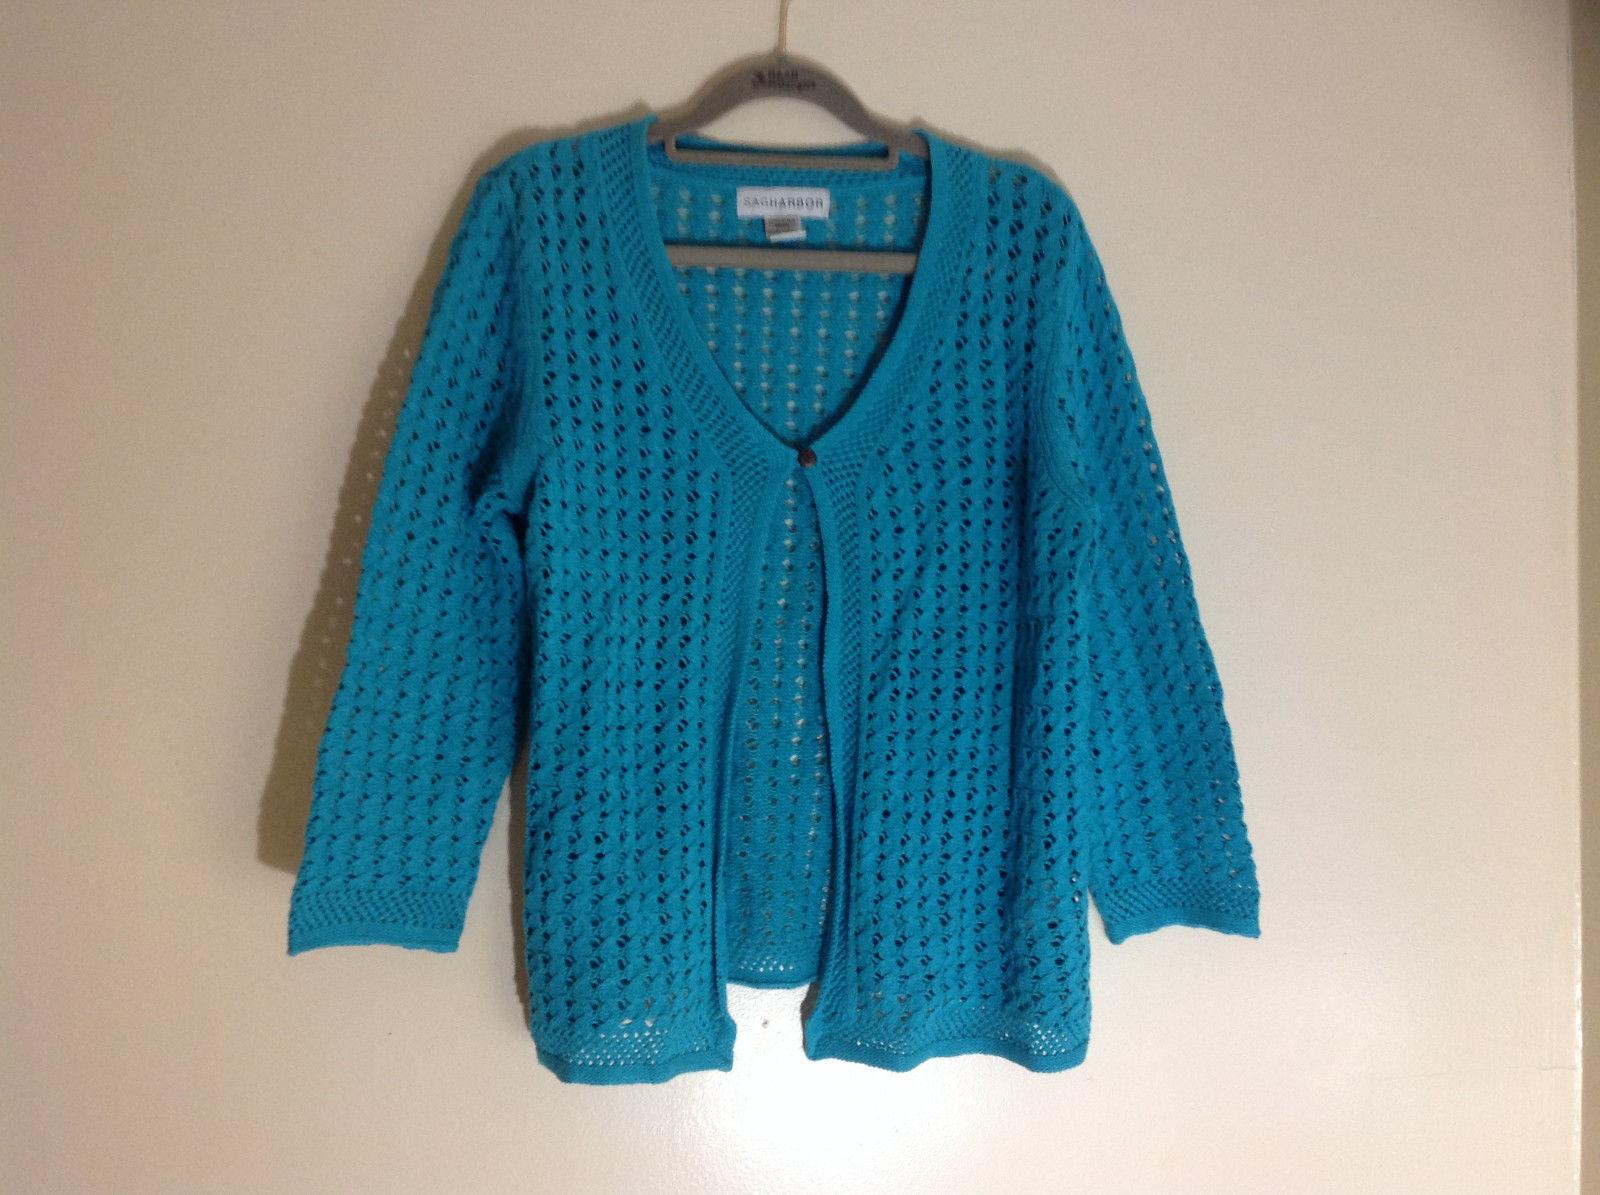 Sag Harbor Torquoises Three Quarter Length Sleeves Sweater Size Medium